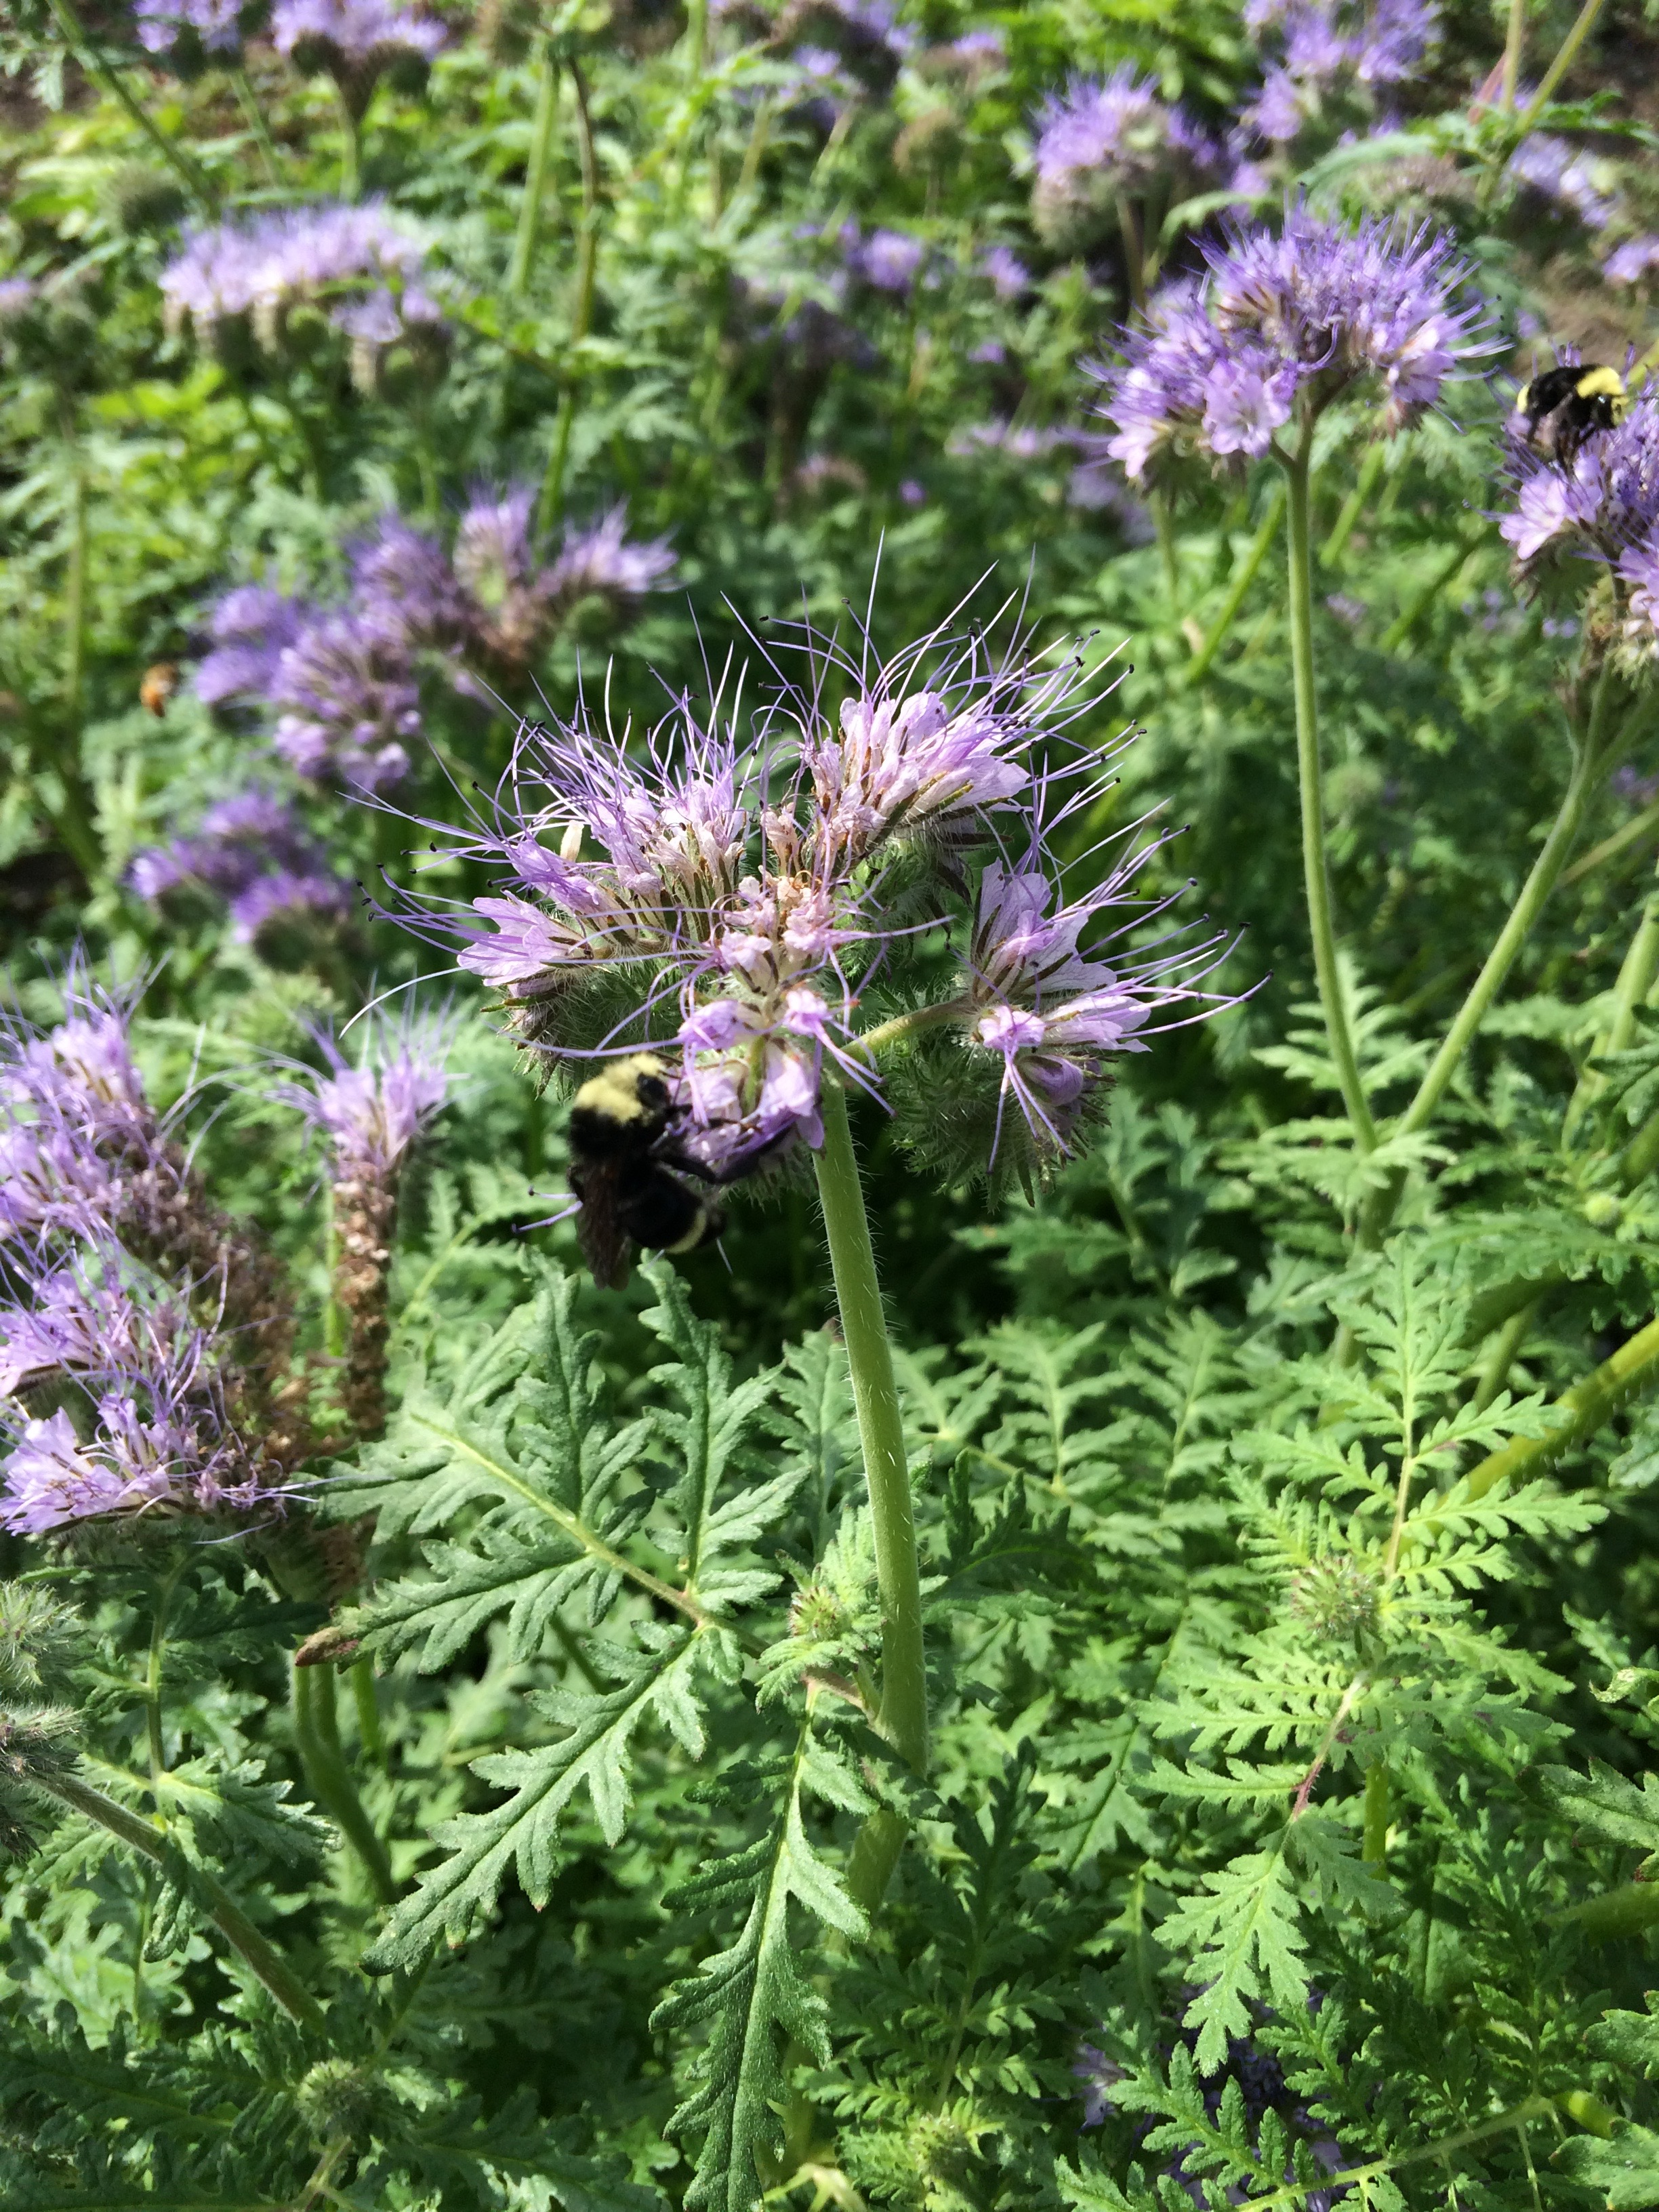 laurelhurst blog  uw botanic gardens october plant profile of phacelia